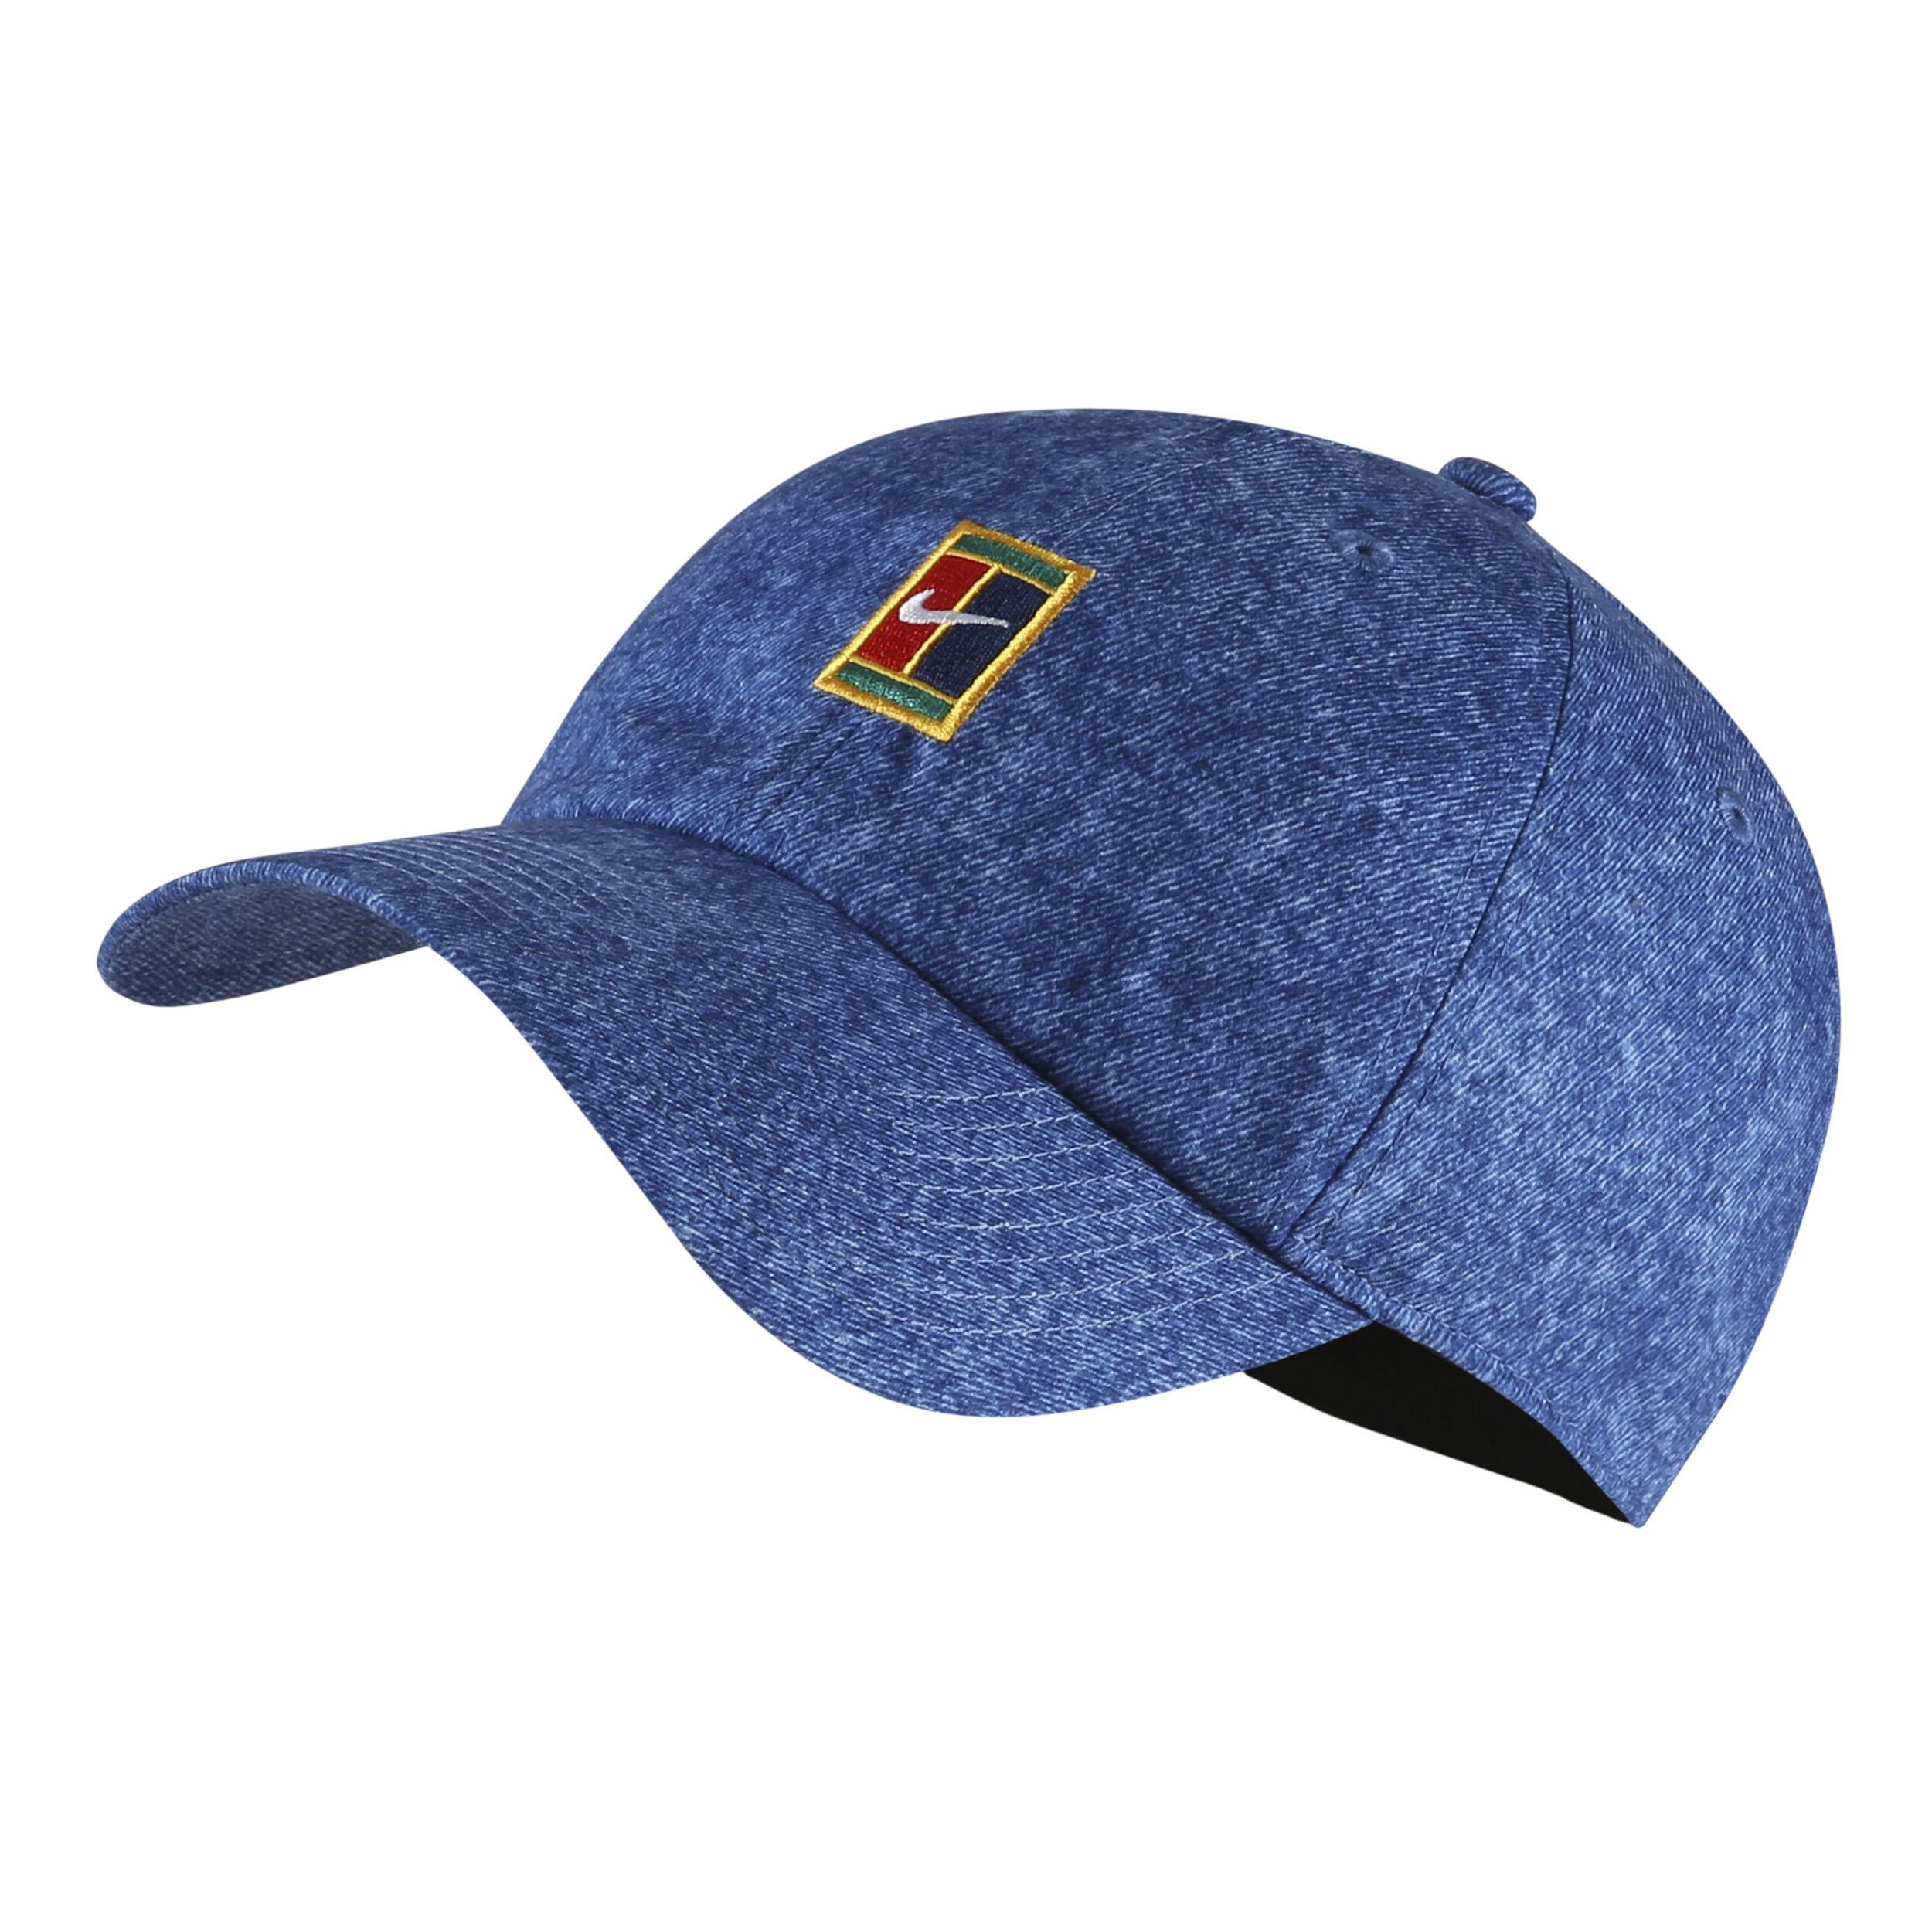 Nike Court Aerobill Heritage86 Cap Blau Hellblau Online Kaufen